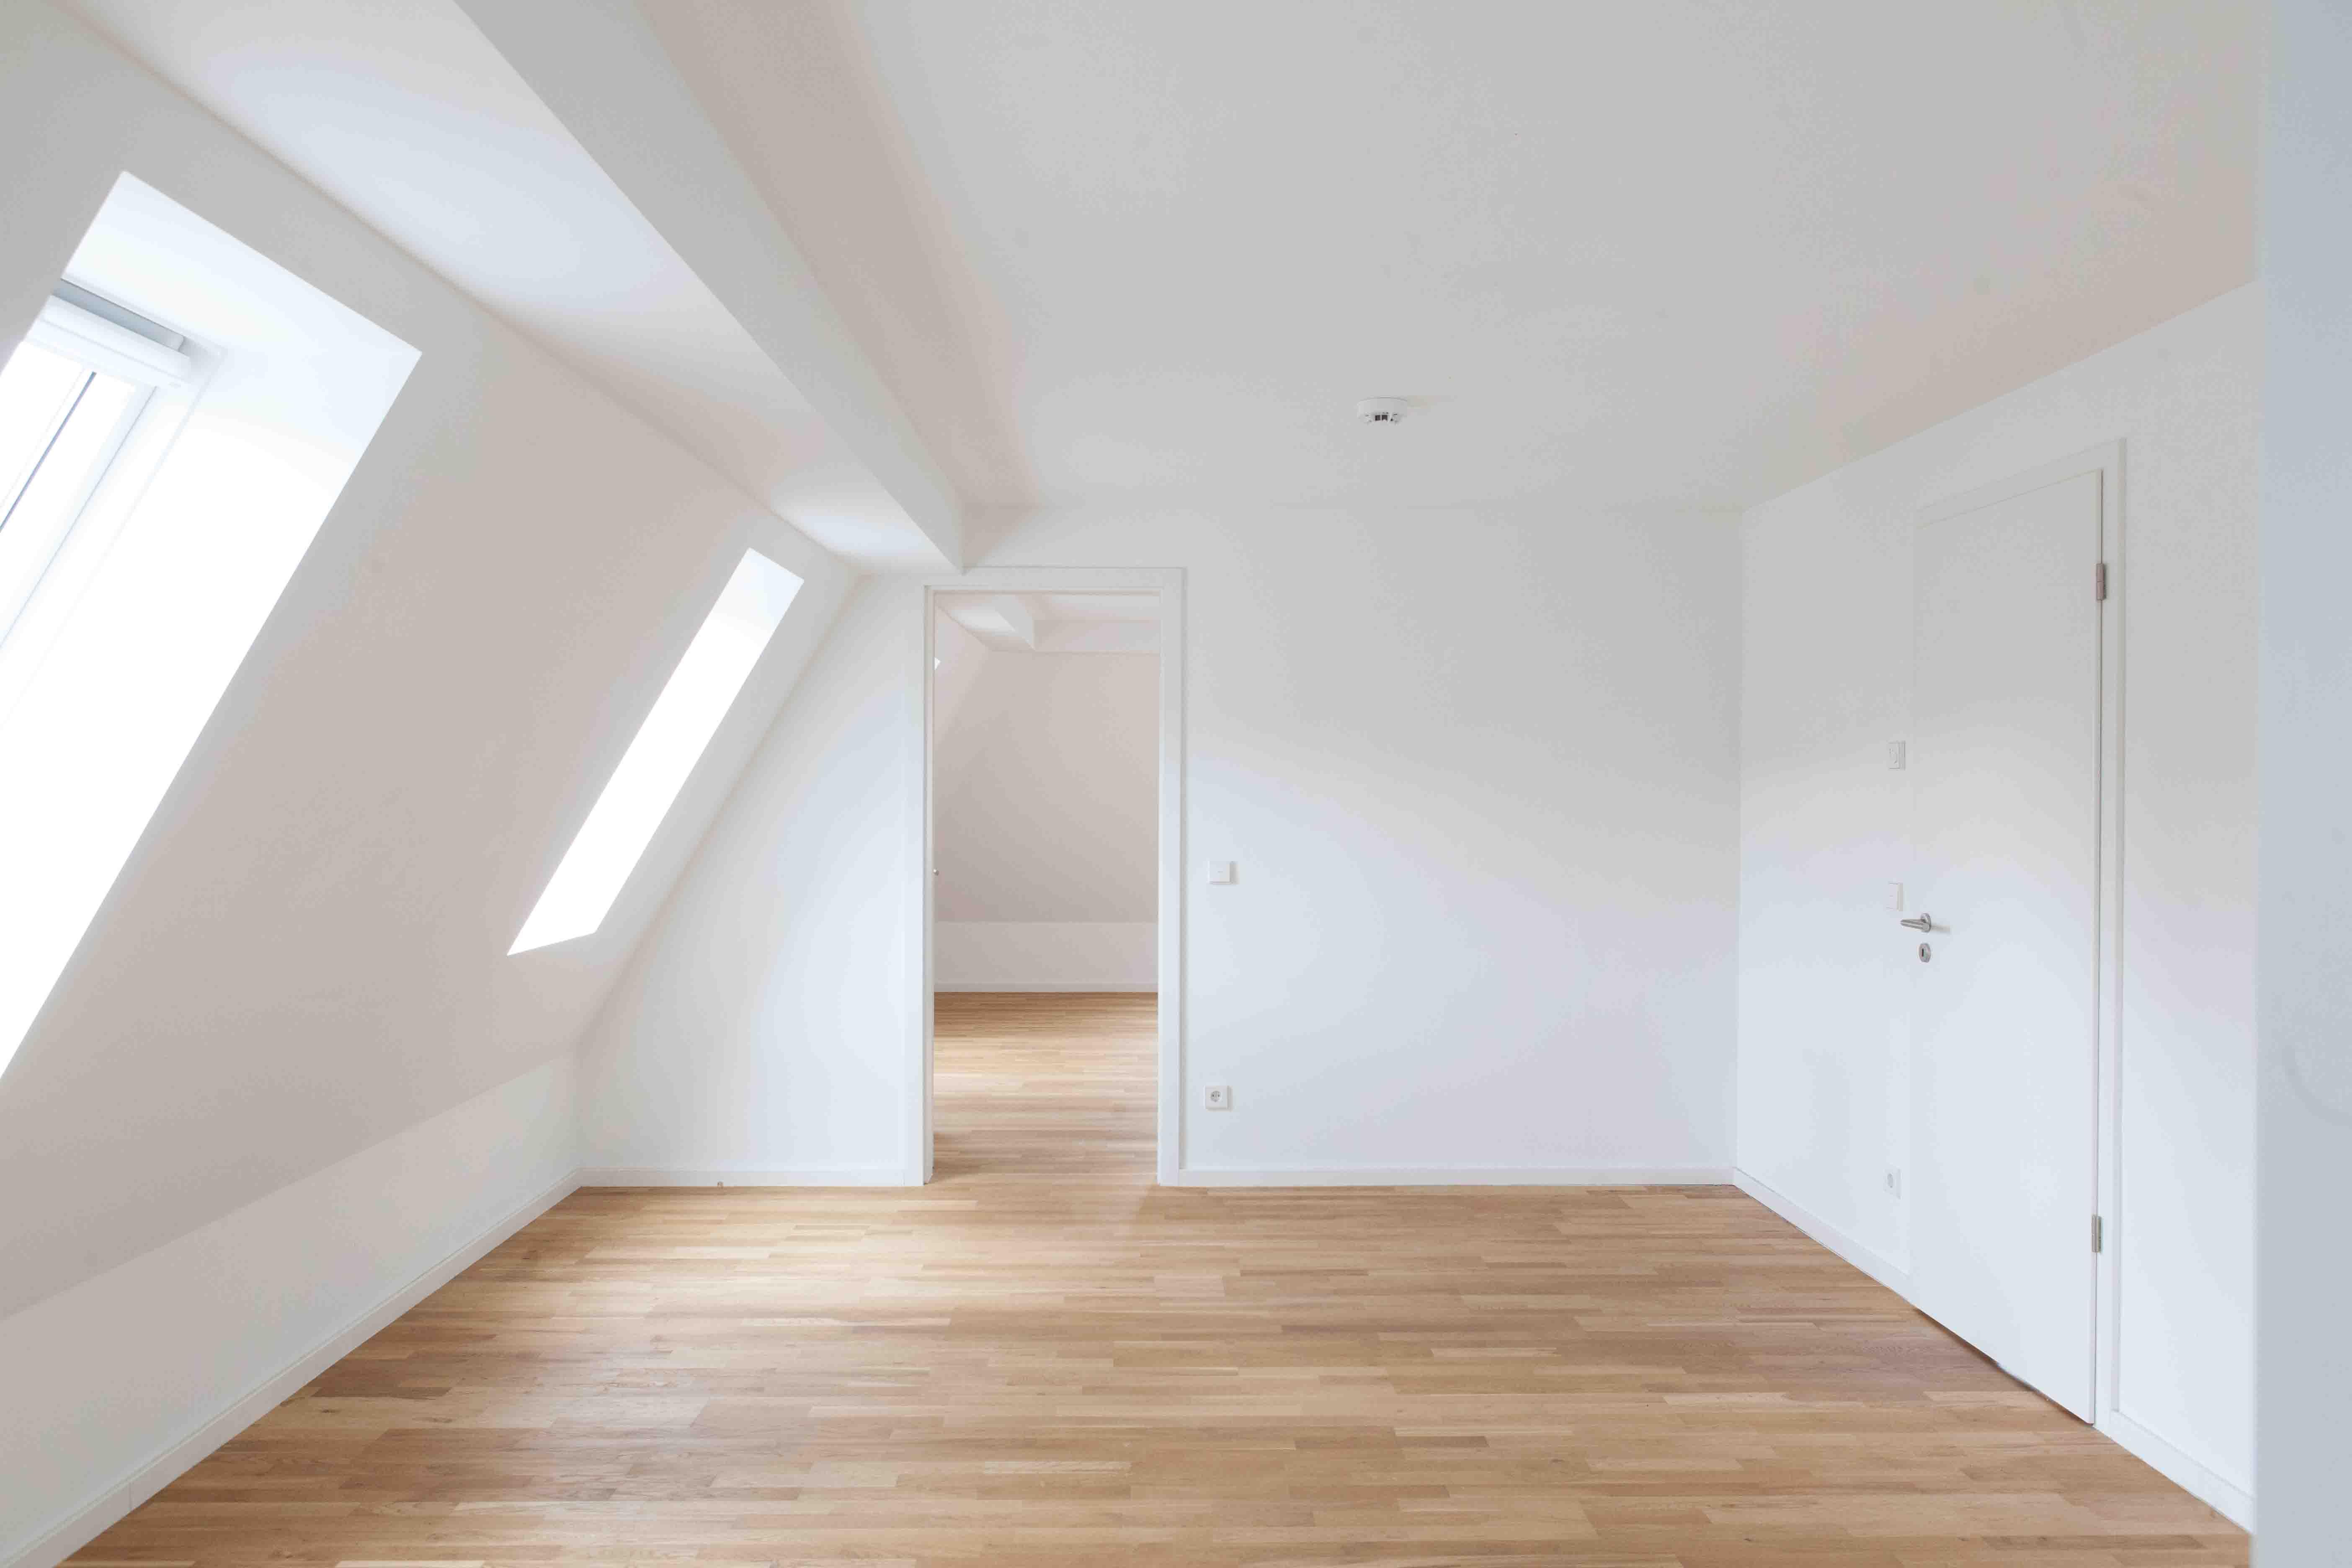 interior fotografie architektur fotografie. Black Bedroom Furniture Sets. Home Design Ideas